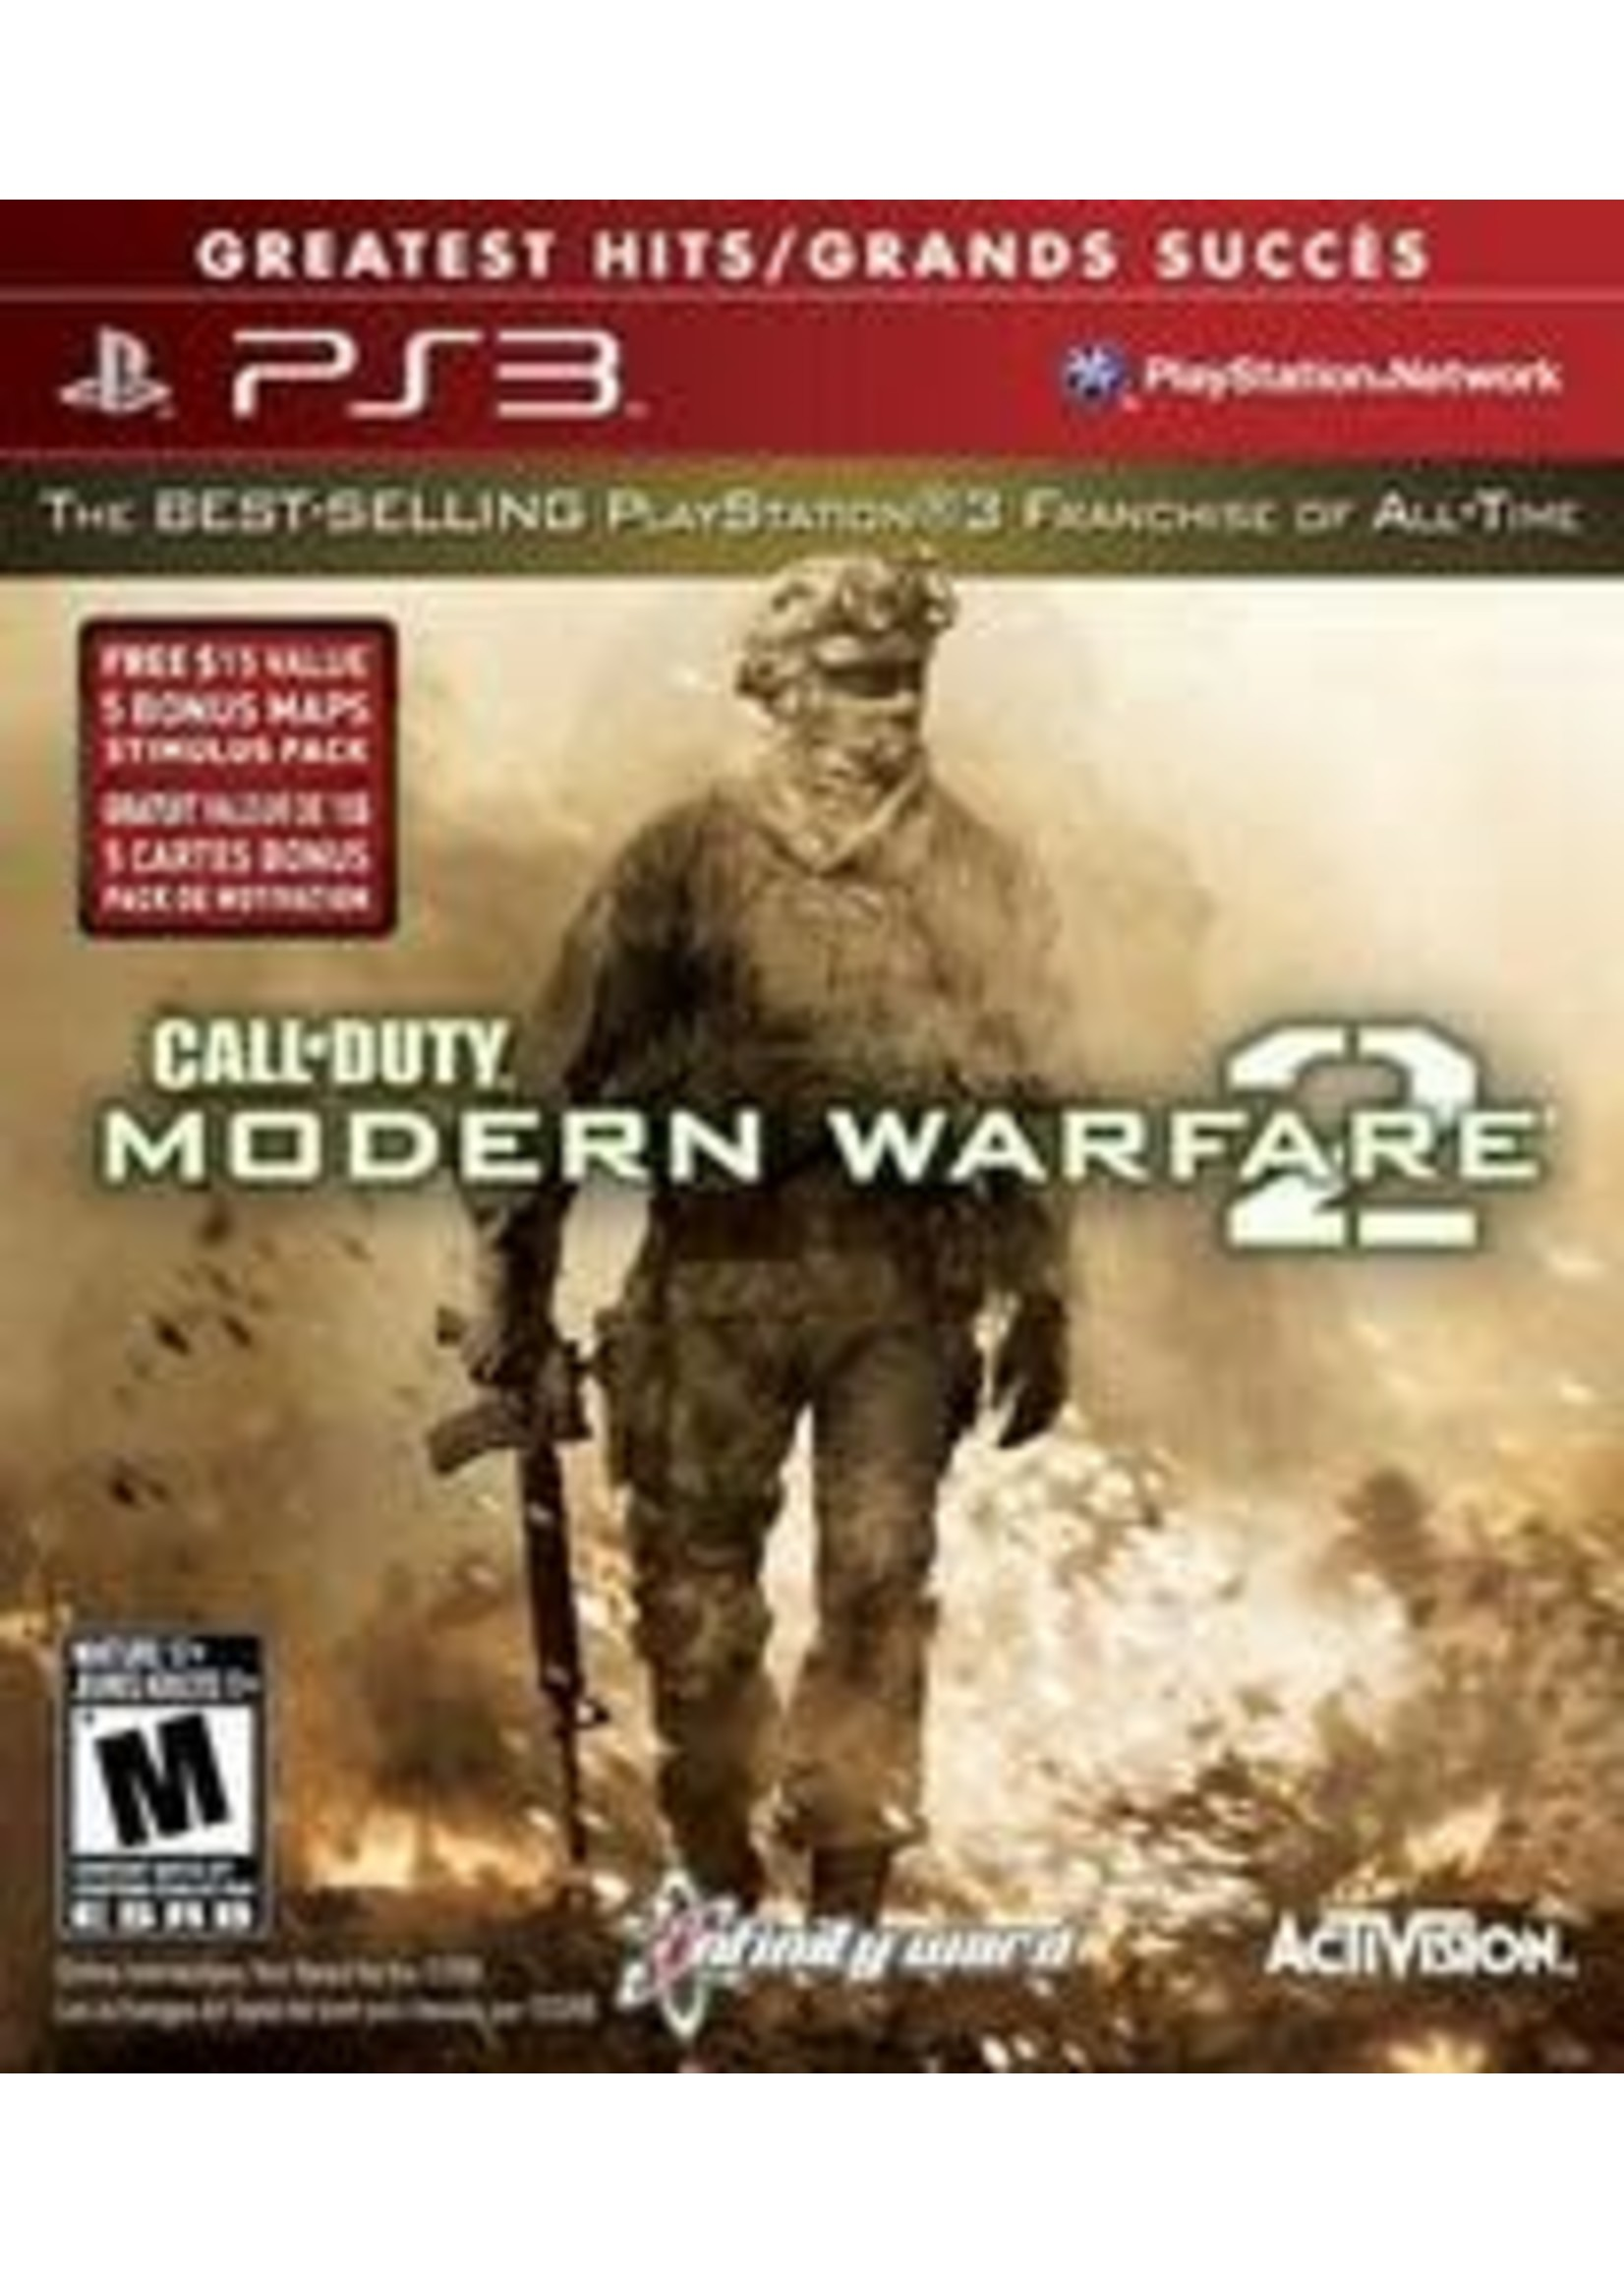 Call Of Duty Modern Warfare 2 [Greatest Hits] Playstation 3